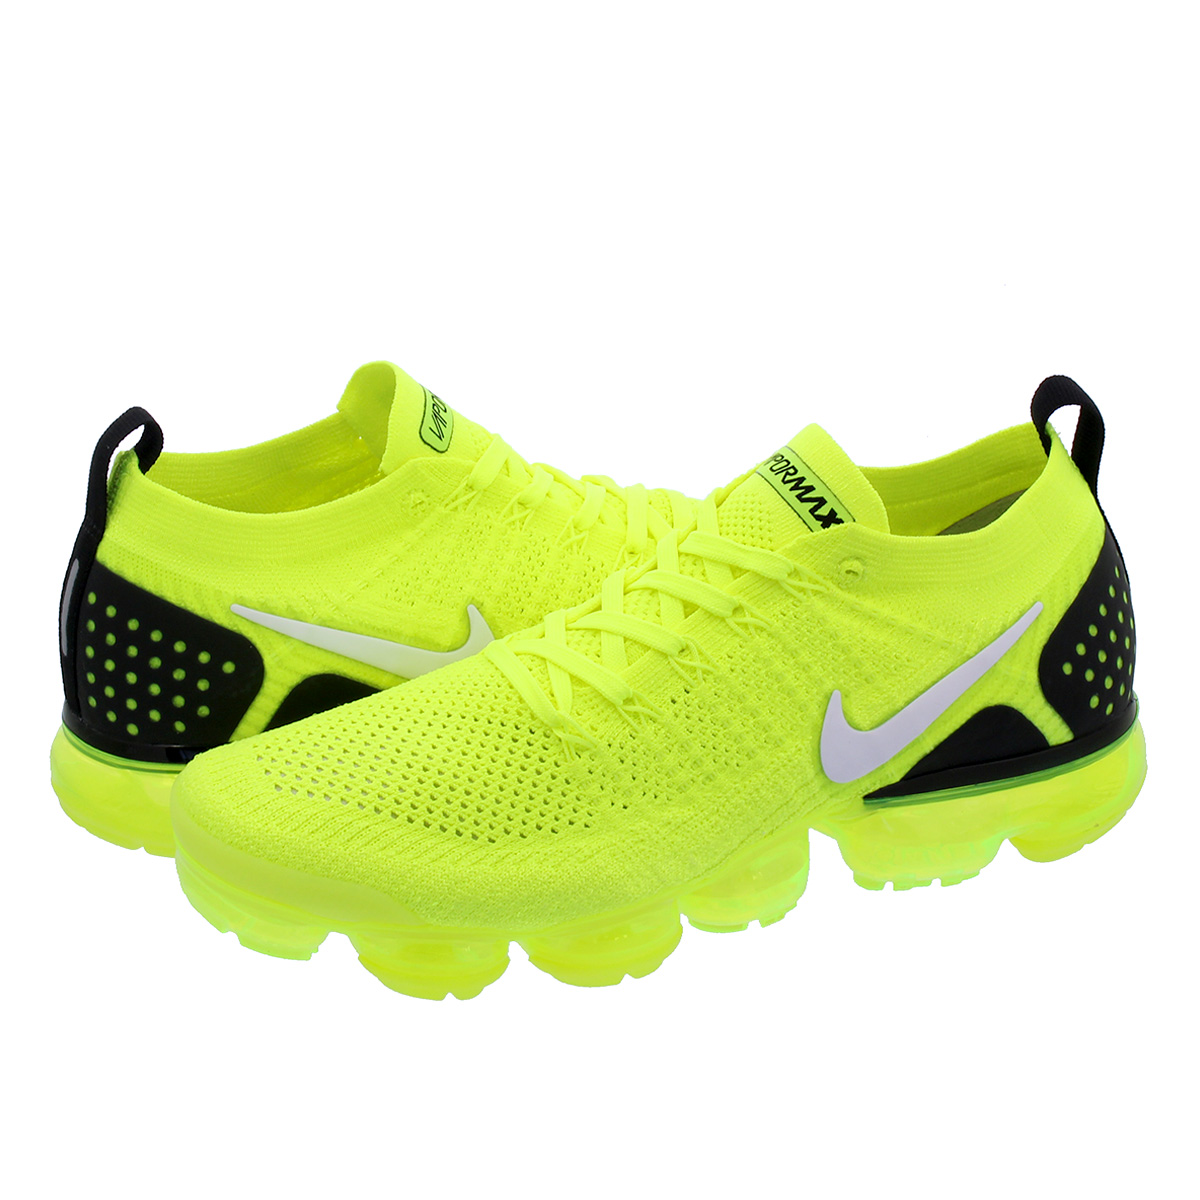 huge discount 12bd9 c6745 NIKE AIR VAPORMAX FLYKNIT 2 Nike vapor max fried food knit 2 VOLT/BLACK  942,842-700